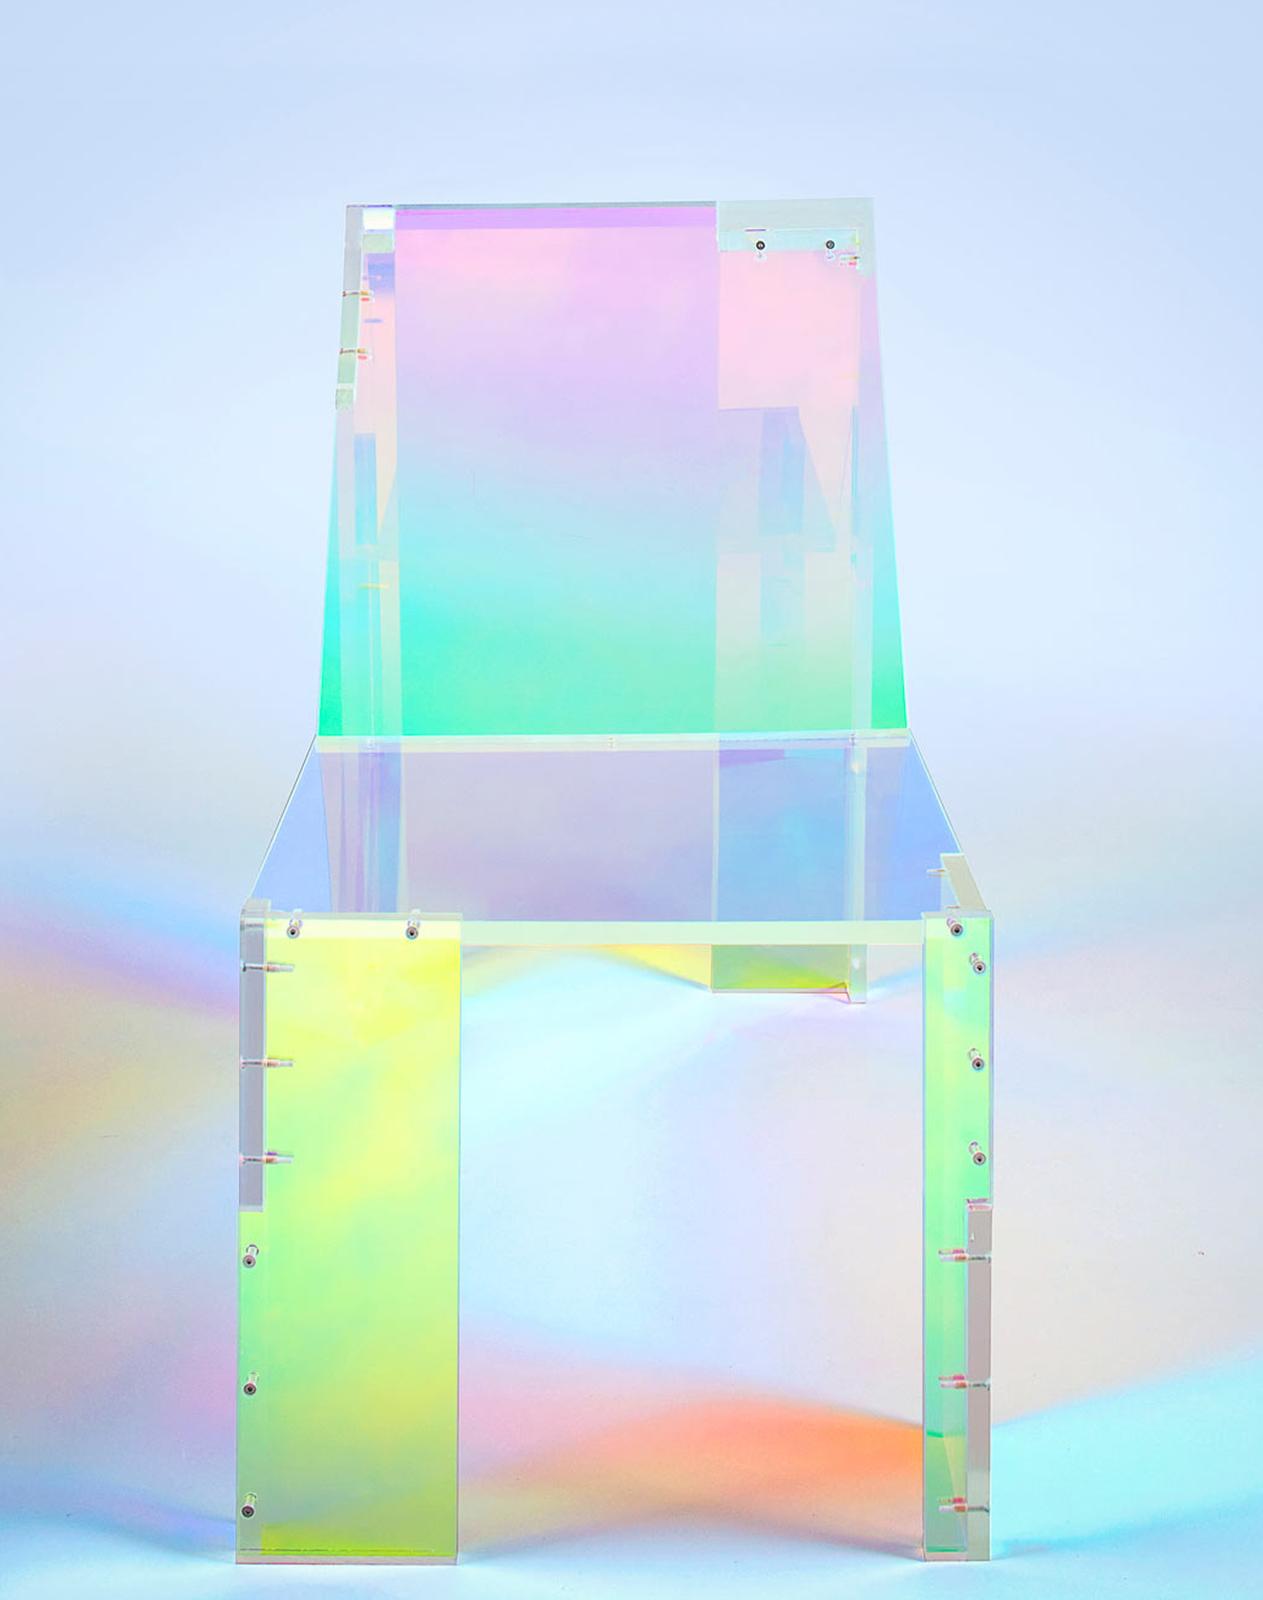 daft-punk-silla-acrilico-colores-arcoiris-3